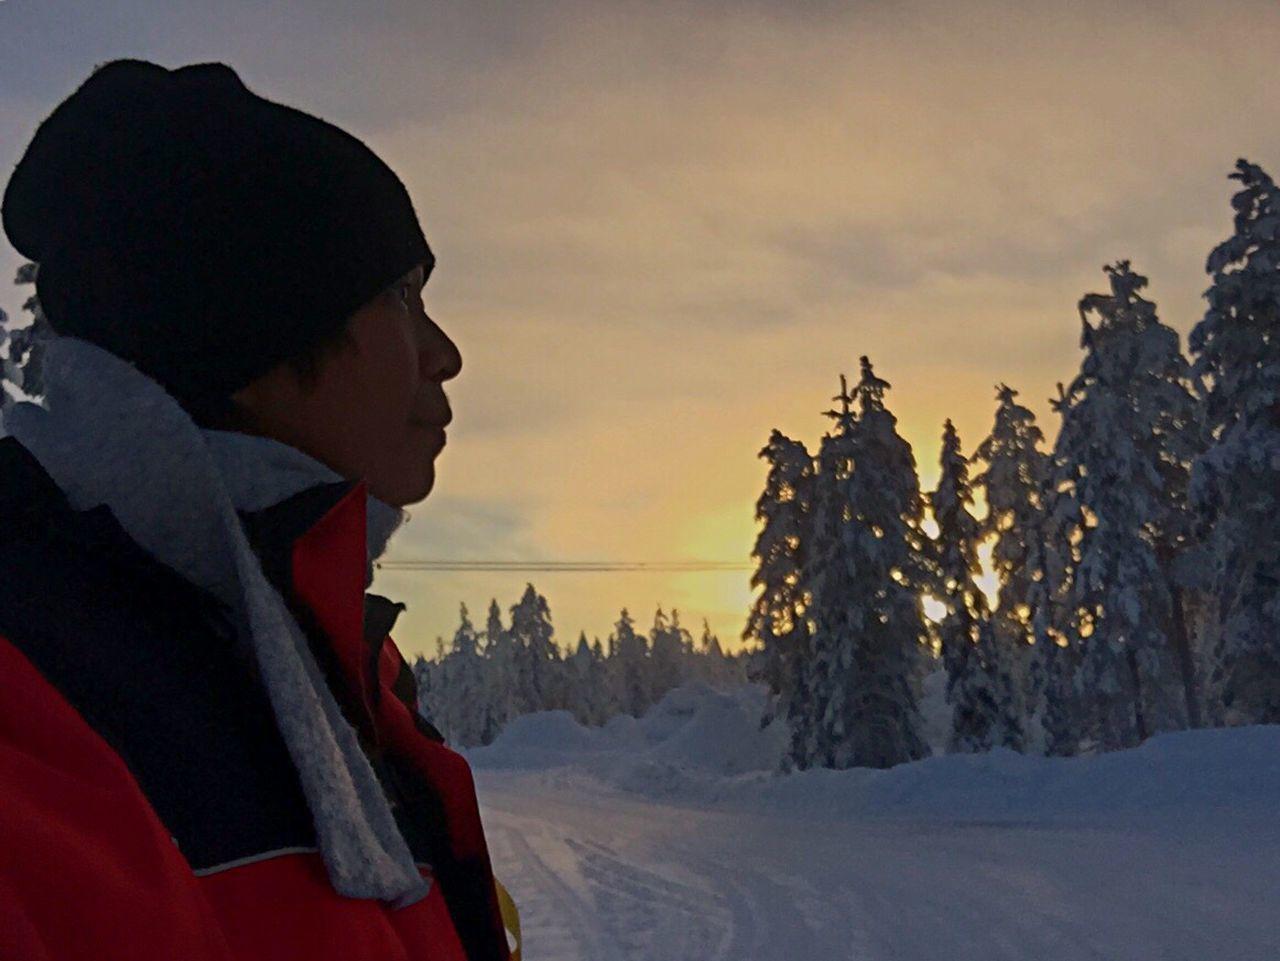 The Tourist LLLimages Winterinfinland2016 Winterinlaplandfinland Aurora Chasing Sojourn IntotheArticCircle Rovaniemi, Finland IPhone Photography Iphonephotography Iphone6 Iphoneonly Learn & Shoot: After Dark IPS2016People